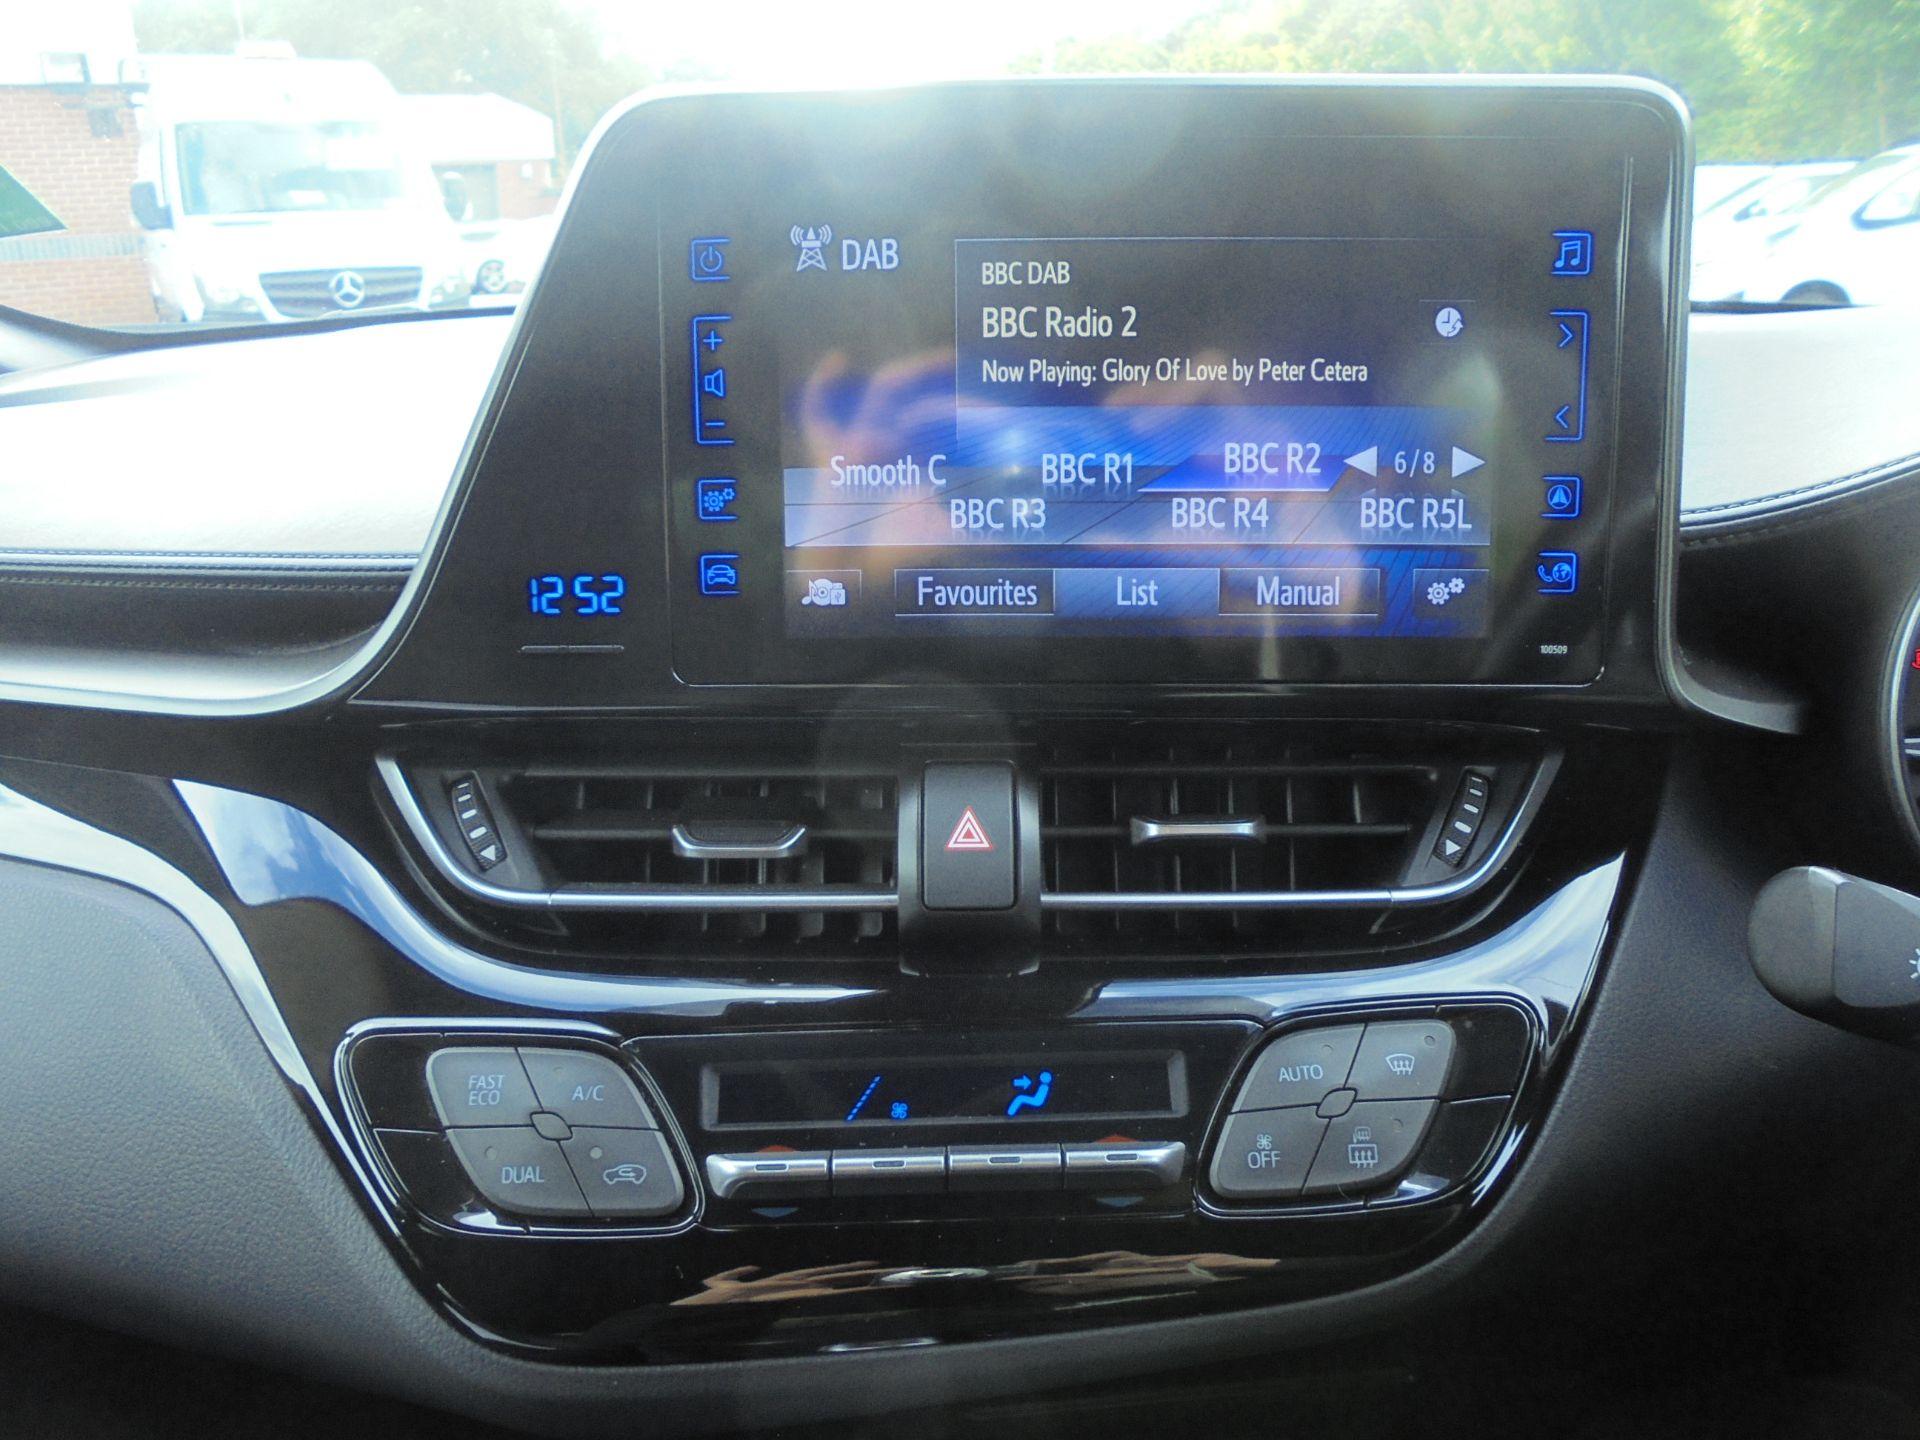 2018 Toyota C-Hr 1.8 Hybrid Icon 5Dr Cvt (NV18NWB) Image 14